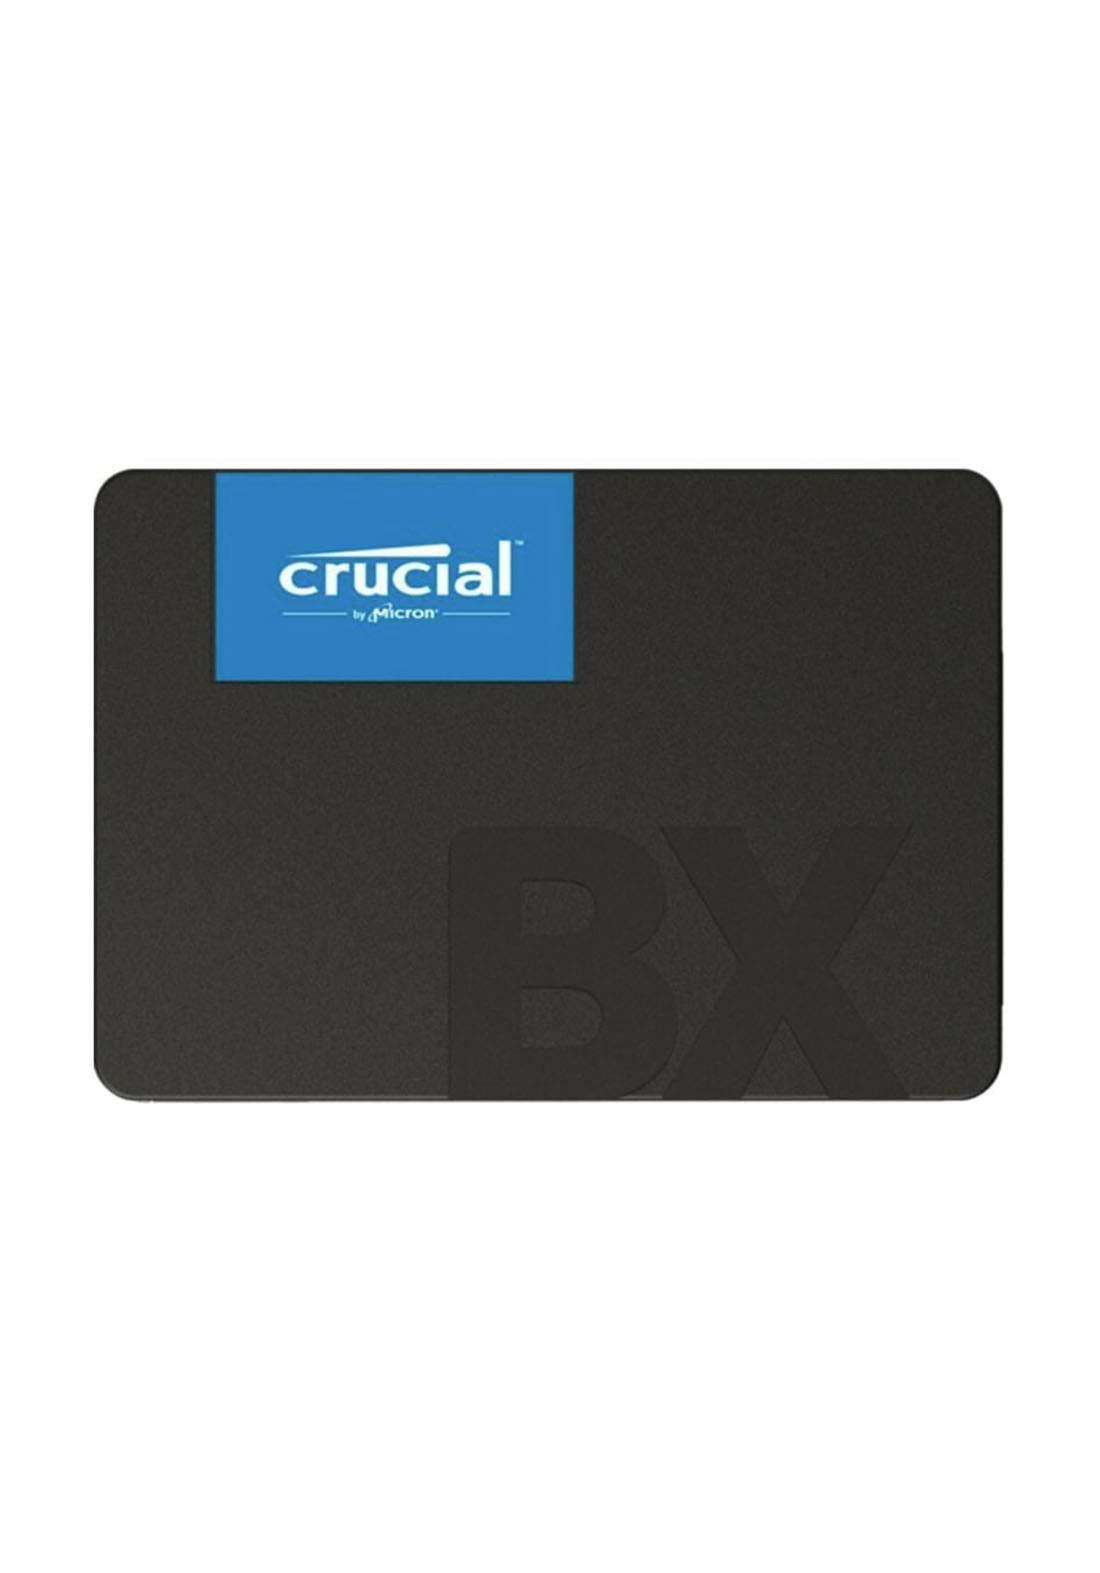 Crucia SSD 120GB Crucial BX500 3D NAND SATA 3 - Black